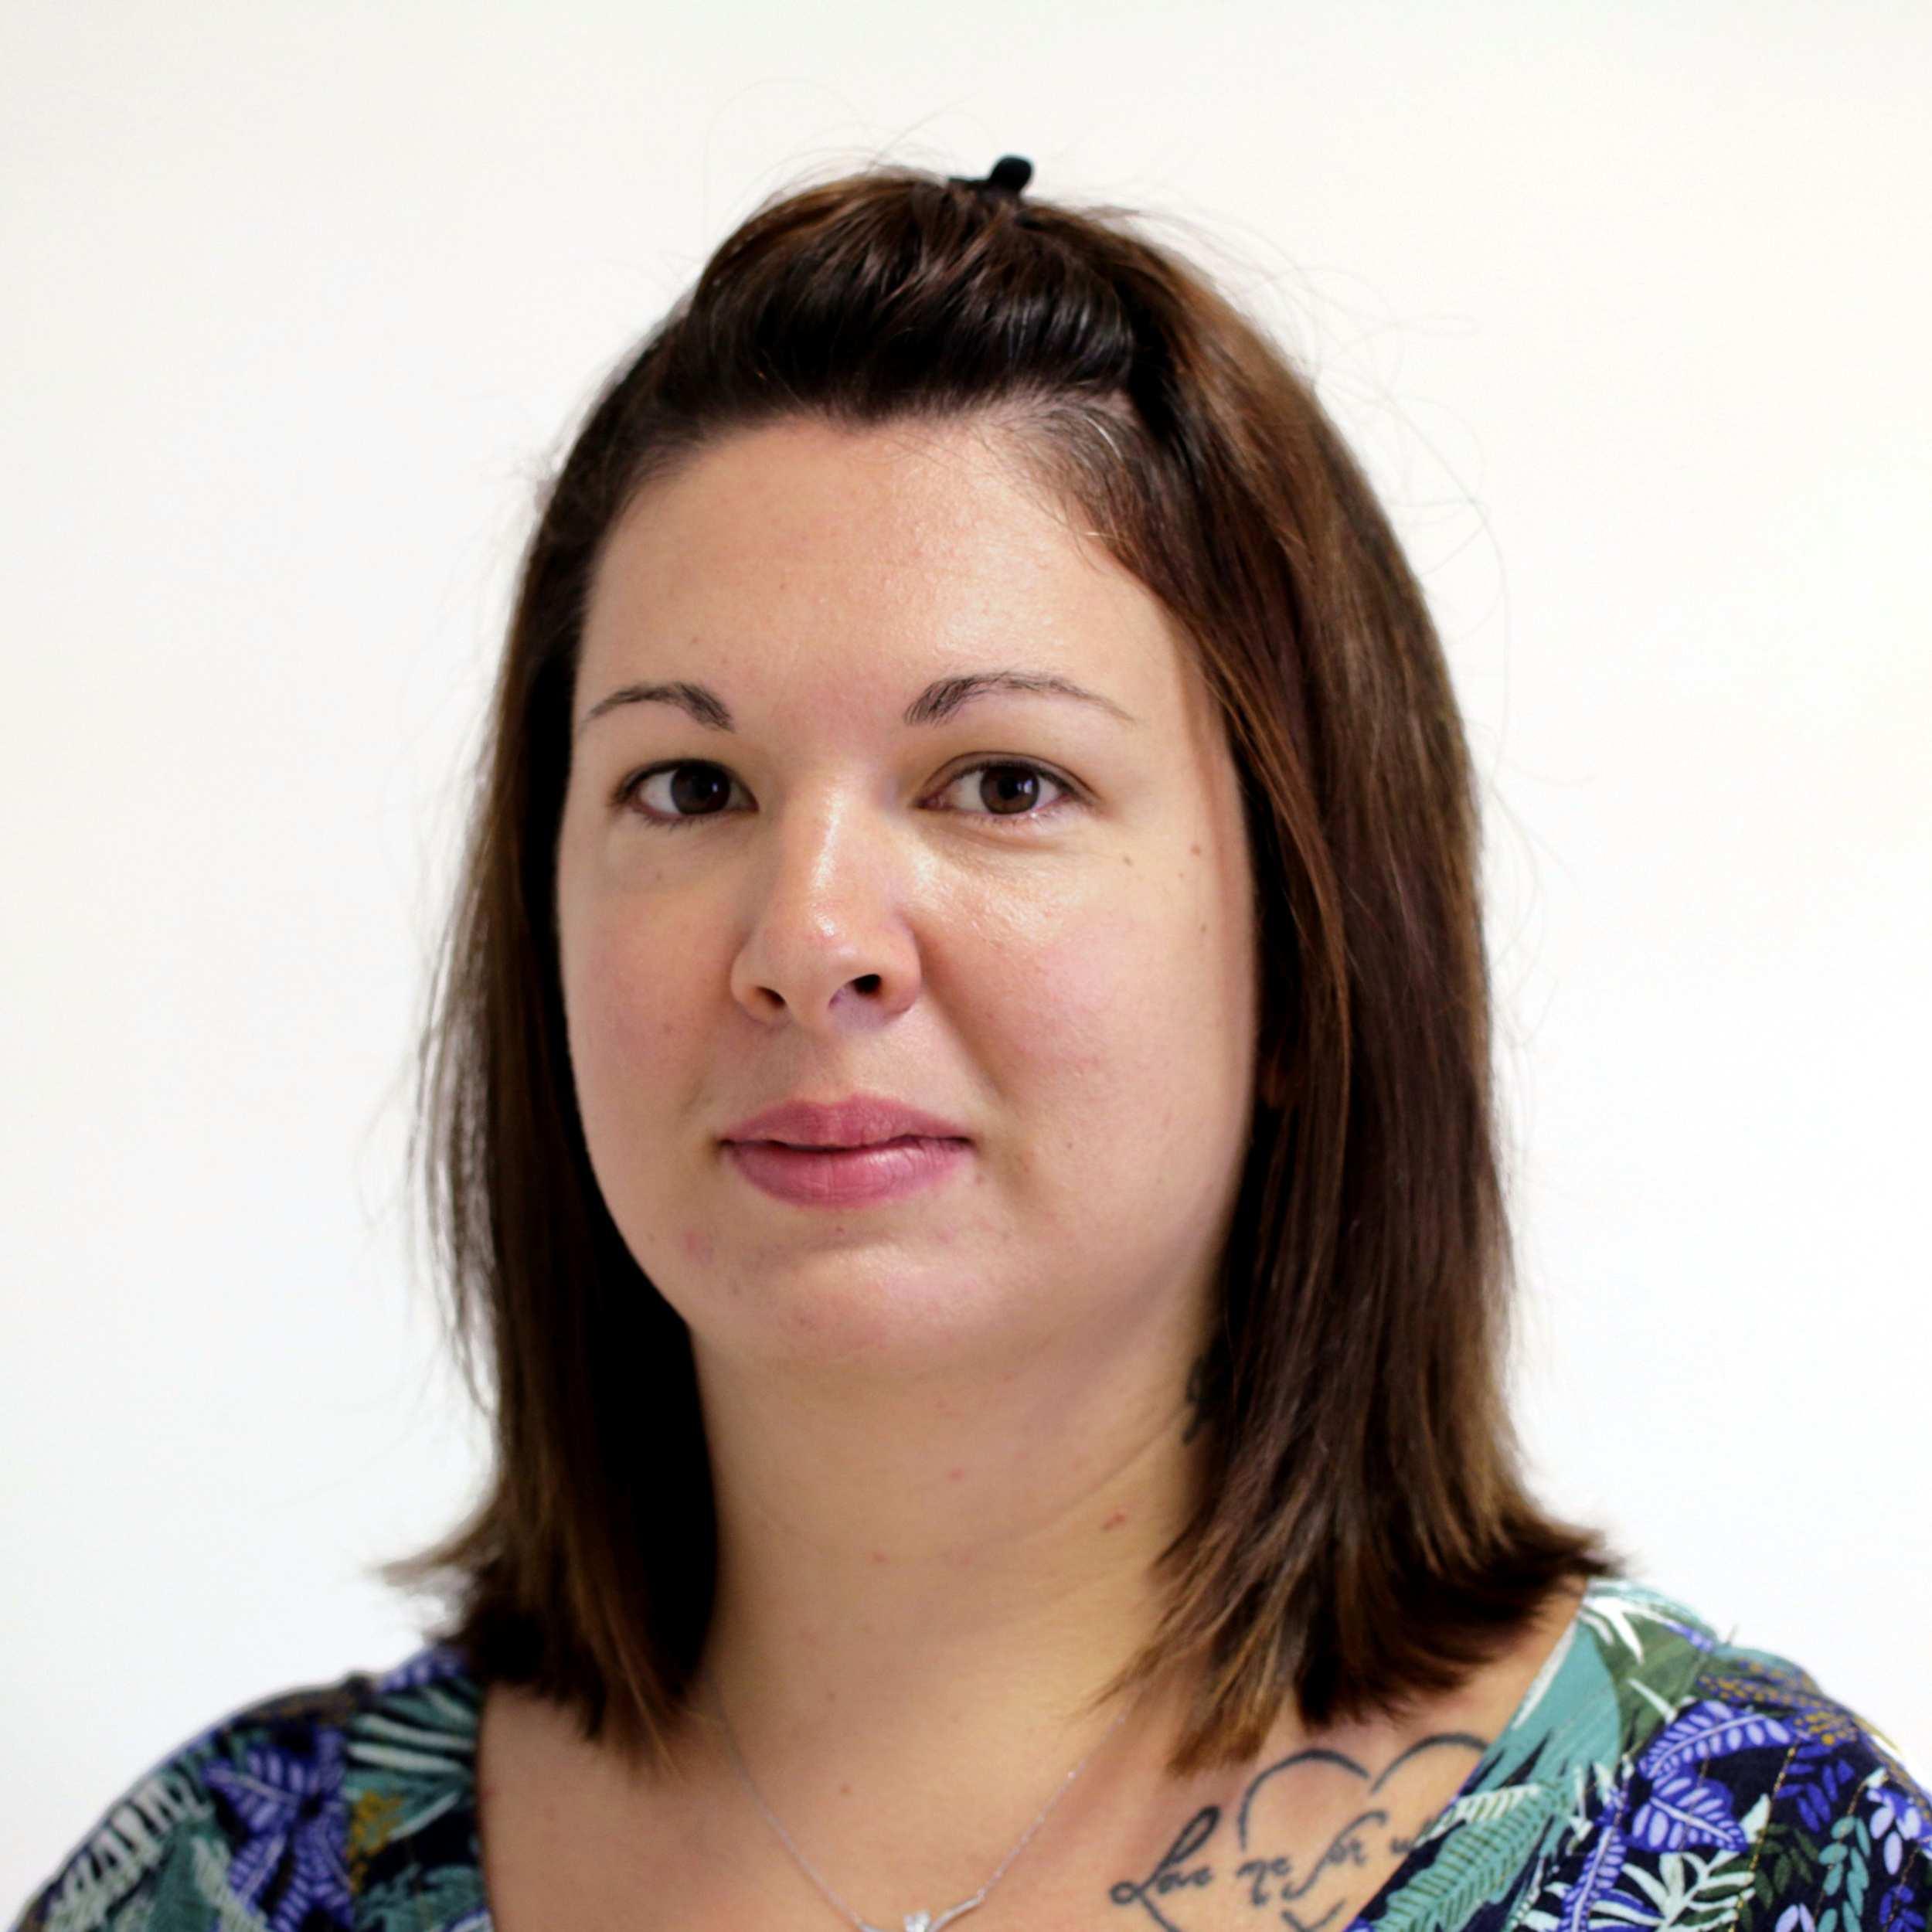 Sarah Trenti